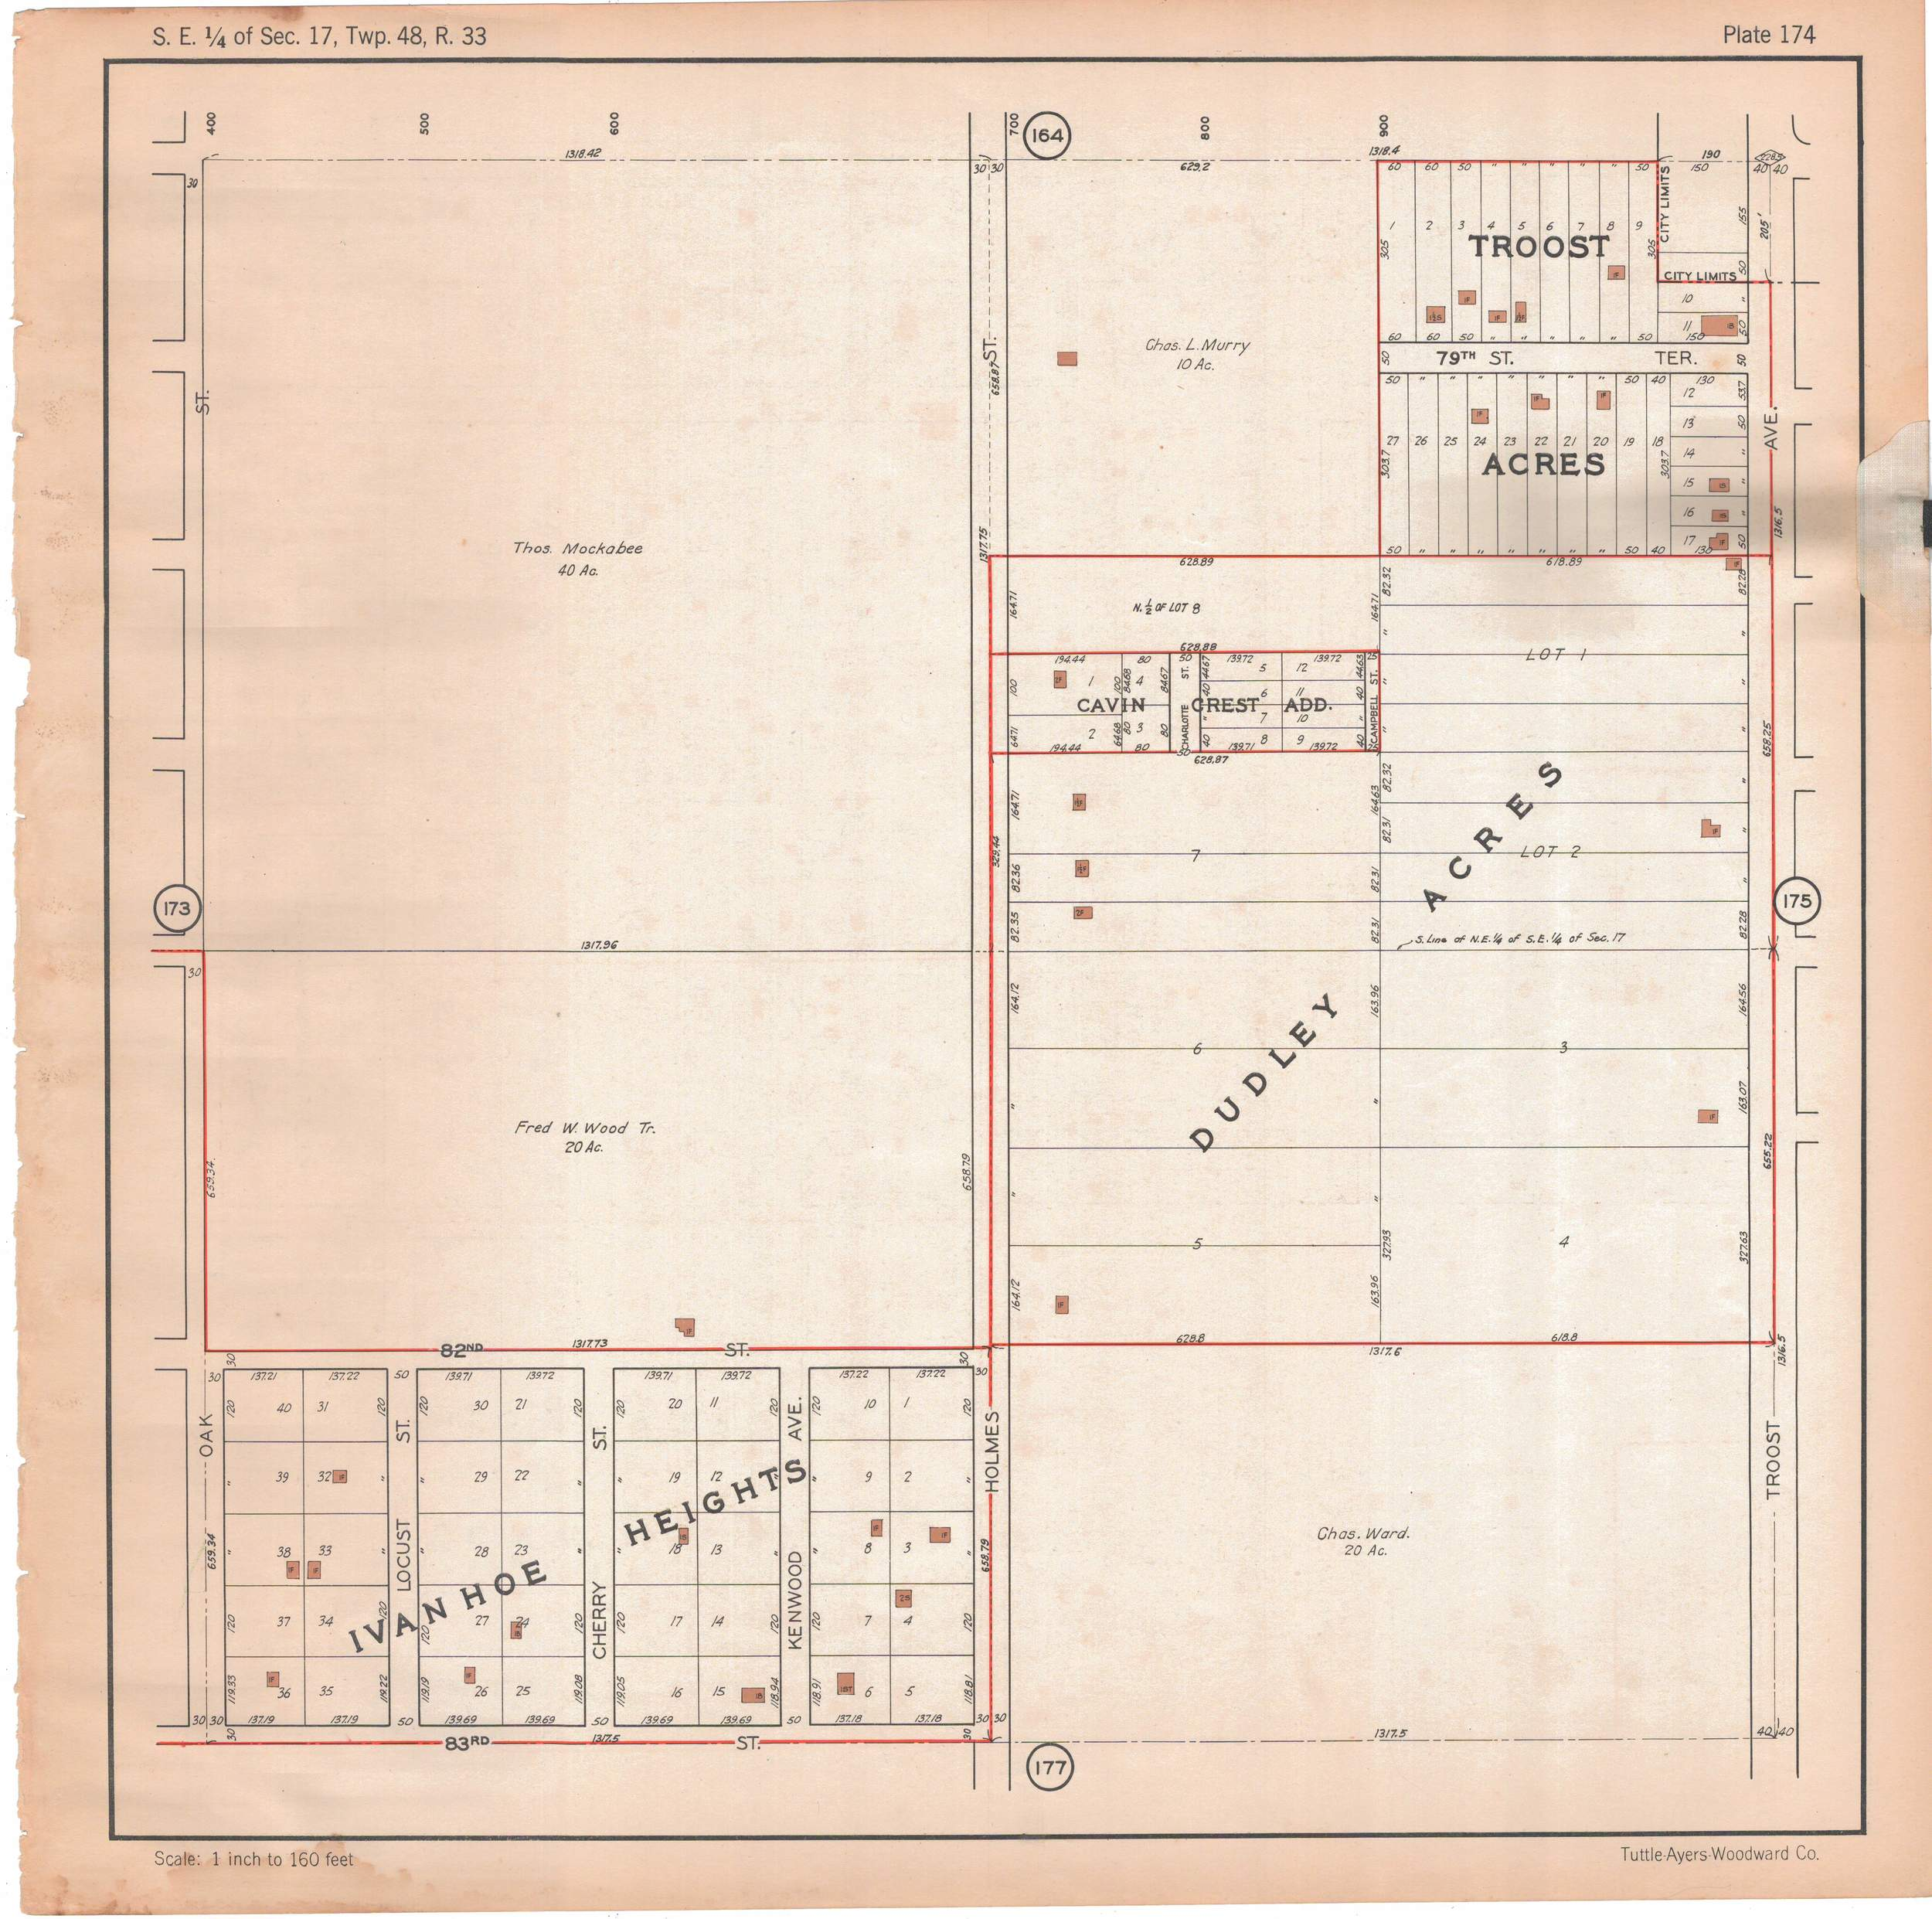 1925 TUTTLE_AYERS_Plate_174.JPG